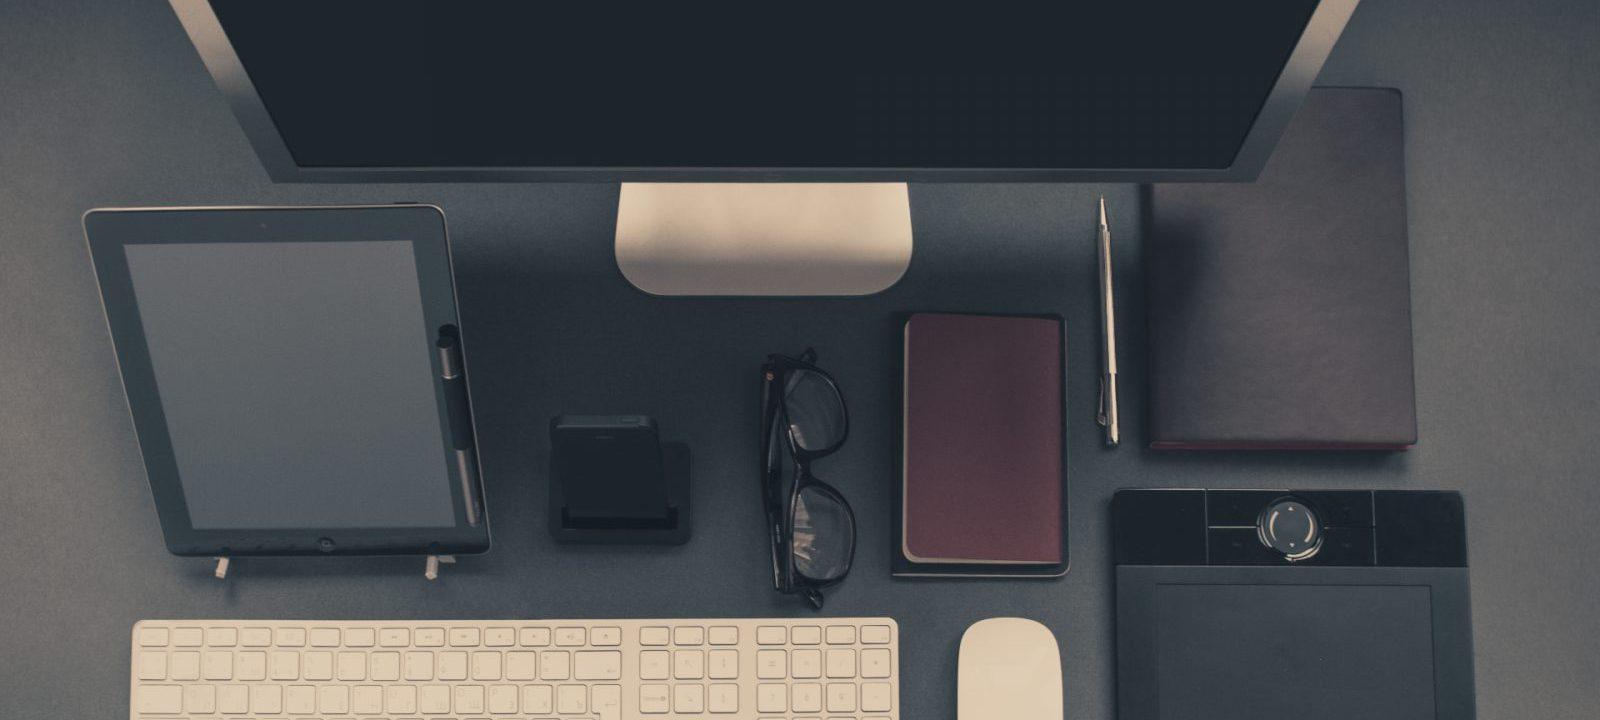 Basiskennis kantoorsoftware